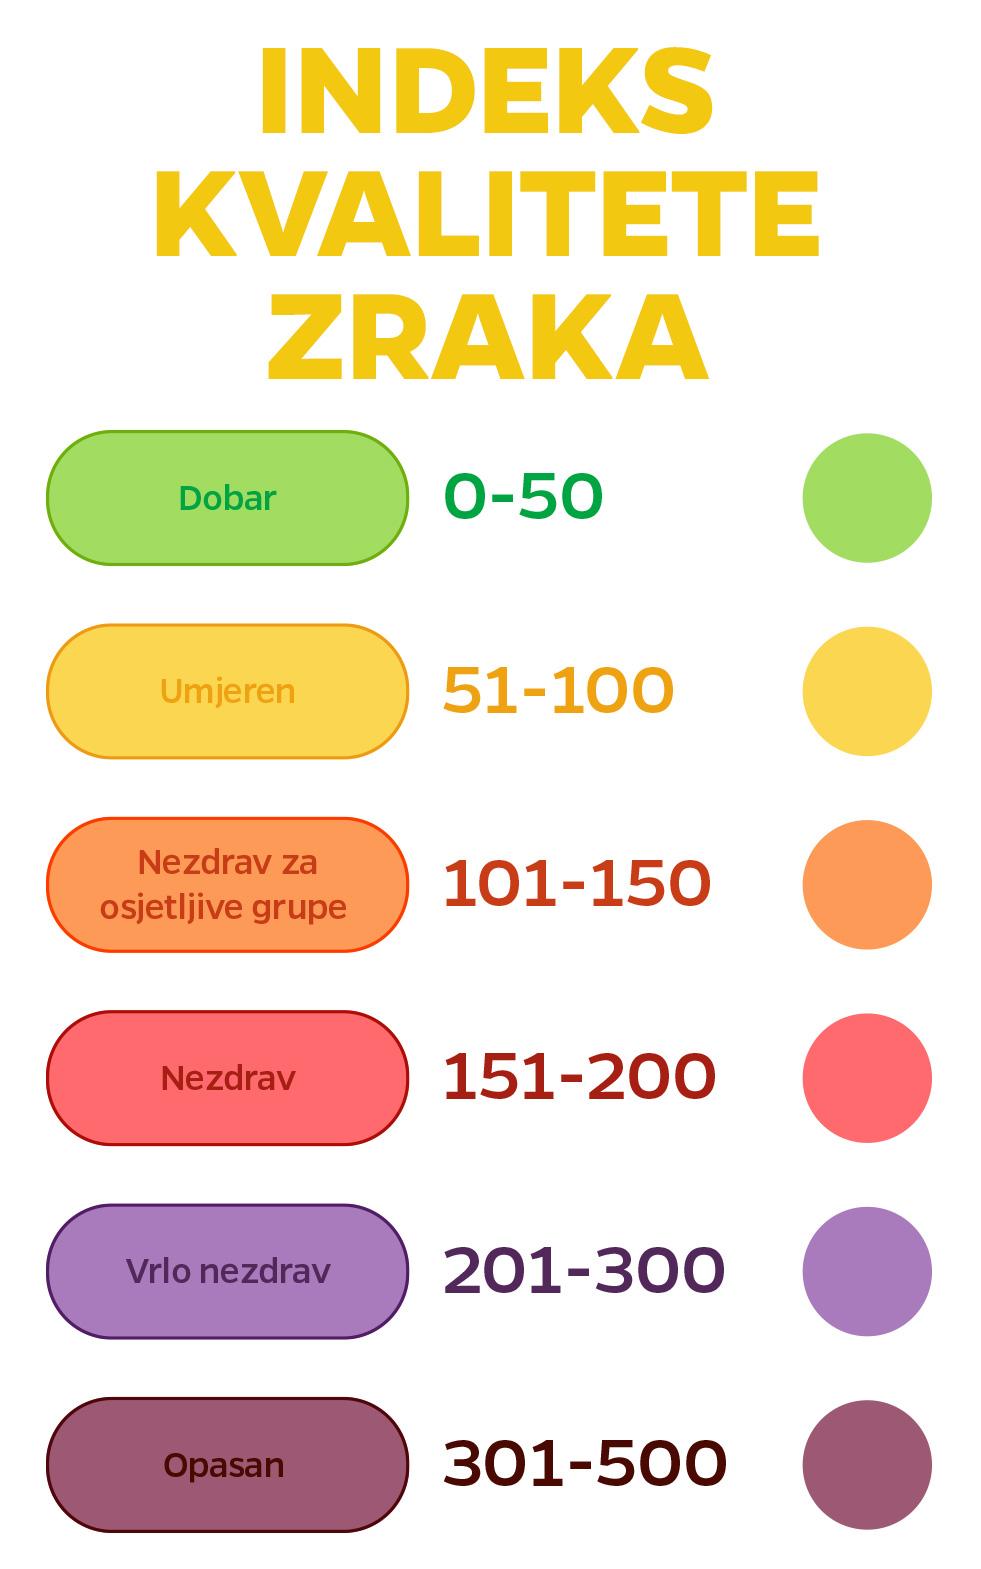 Indeks kvaliteta zraka